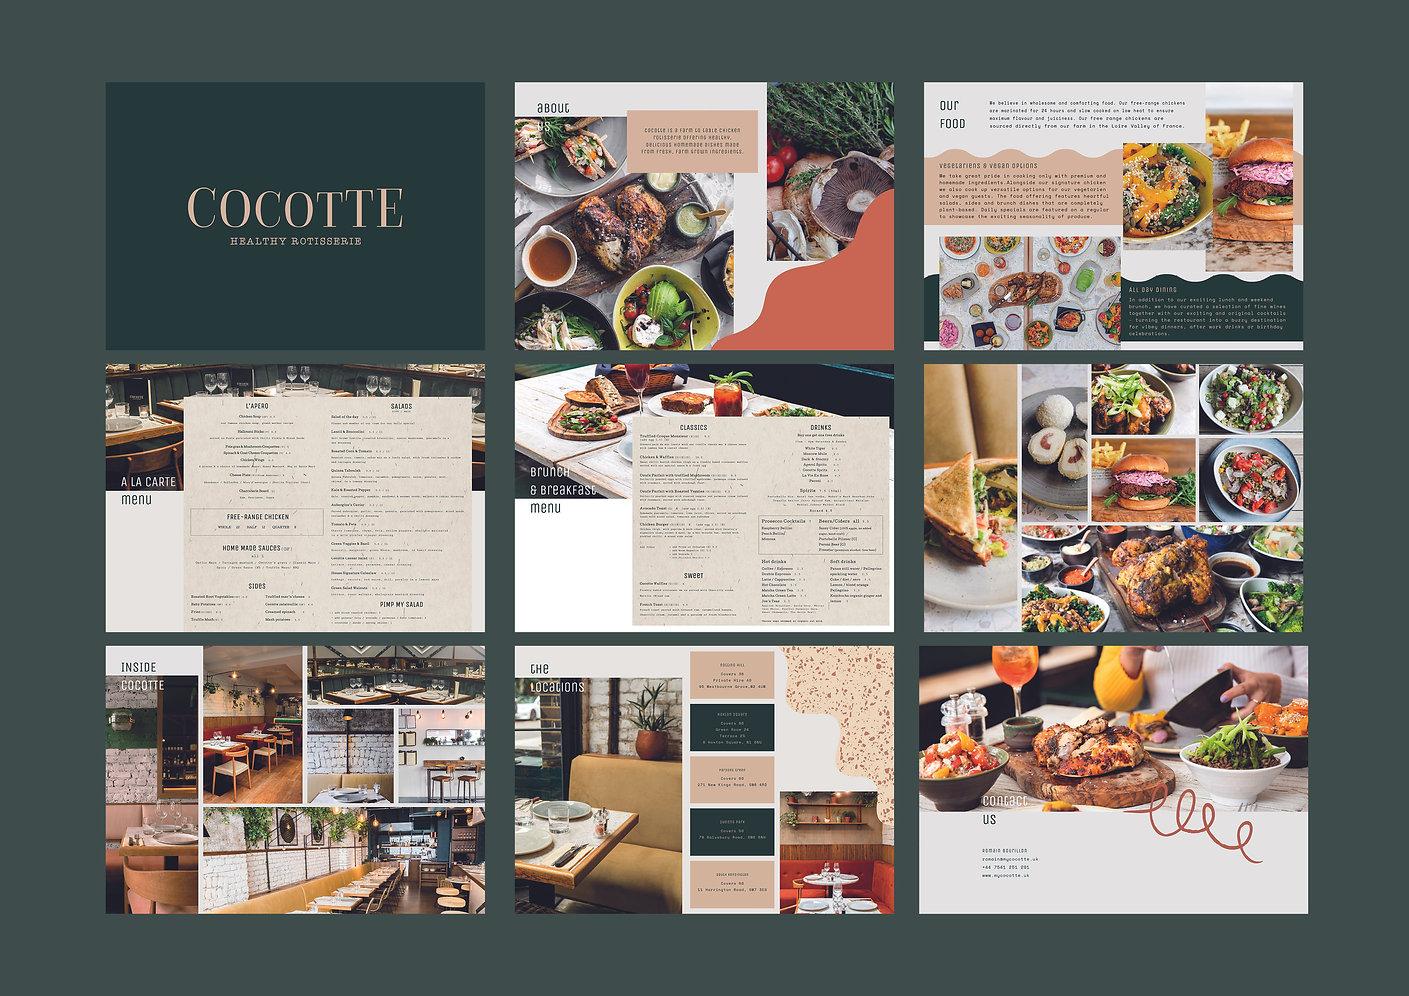 Cocotte presentation